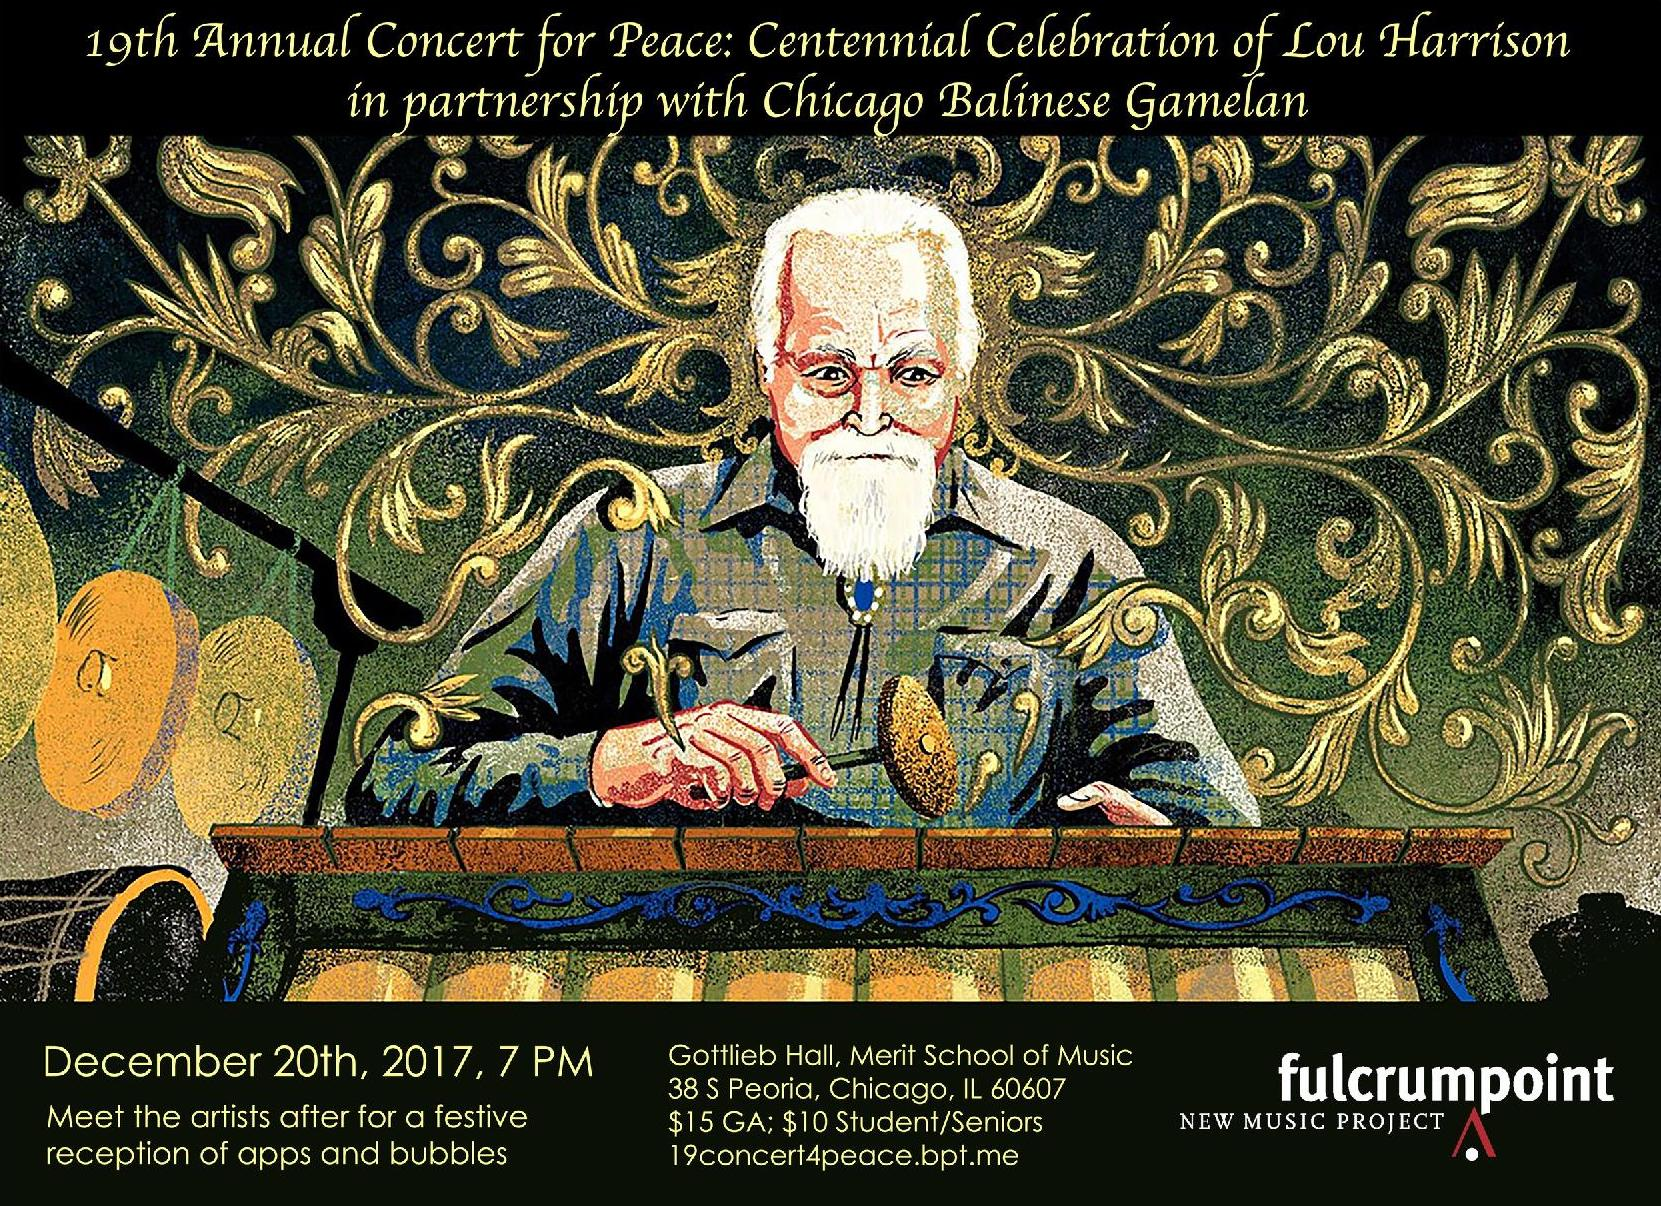 Concert for Peace: Centennial Celebration of Lou Harrison